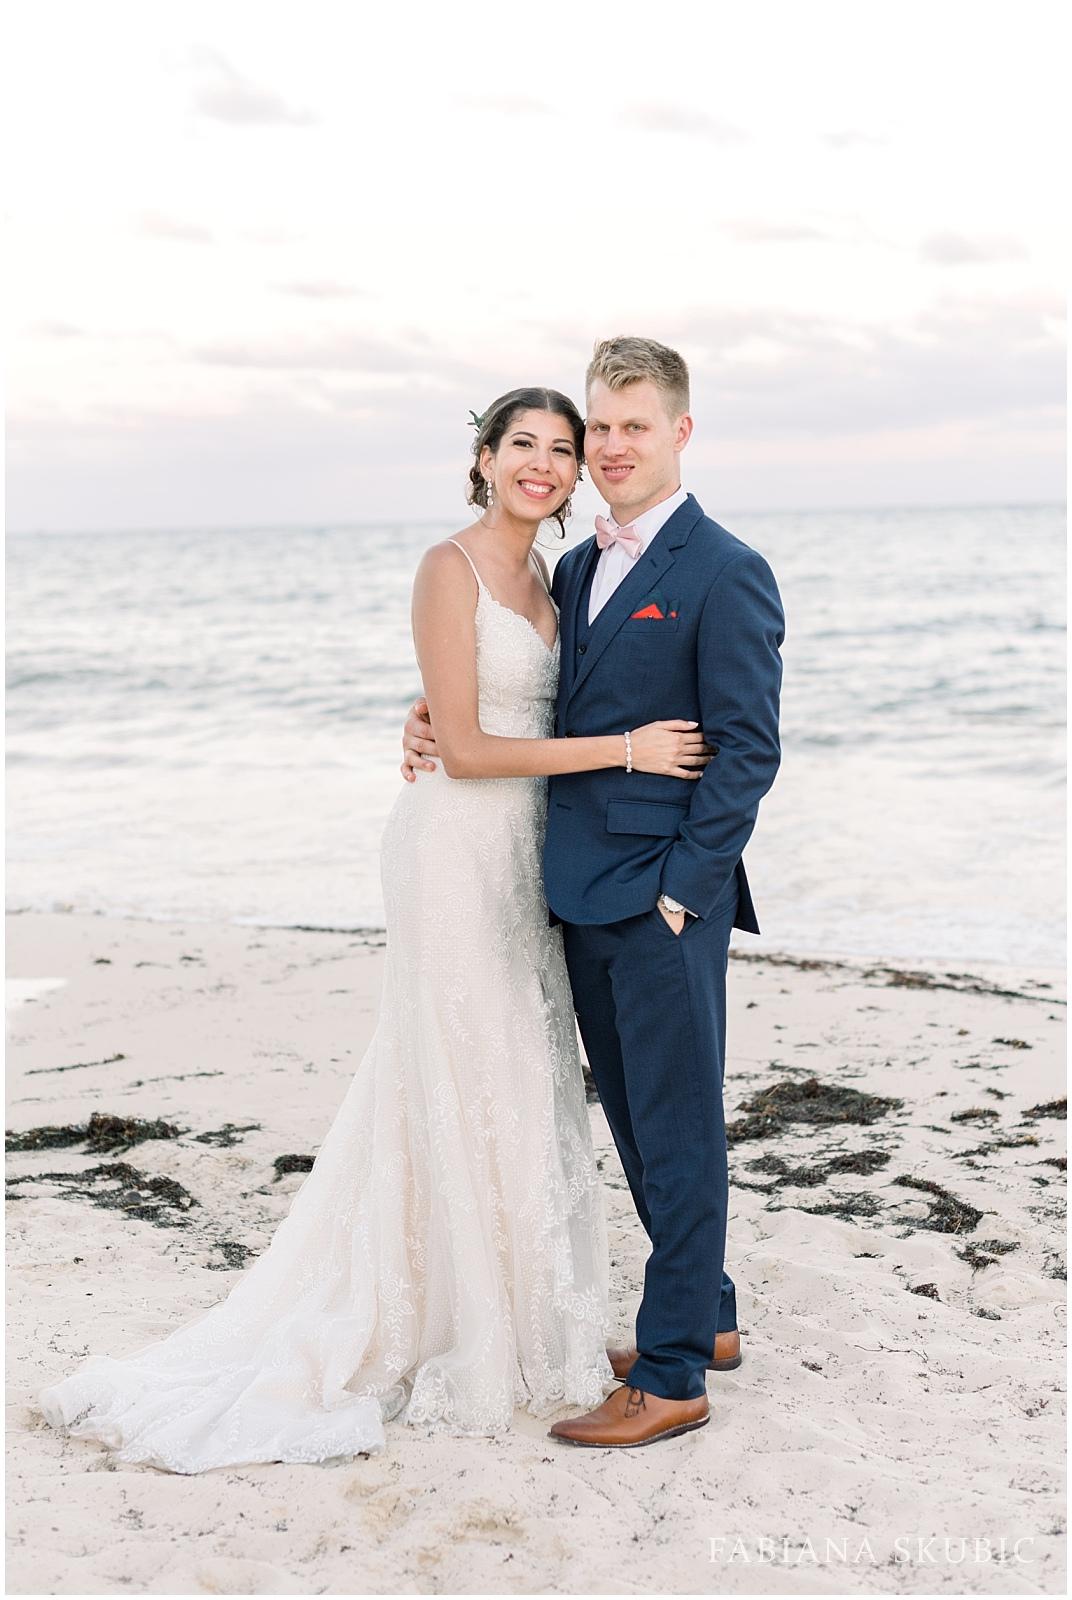 TJ_Now_Sapphire_Riviera_Cancun_Mexico_Wedding_Photos_0271.jpg